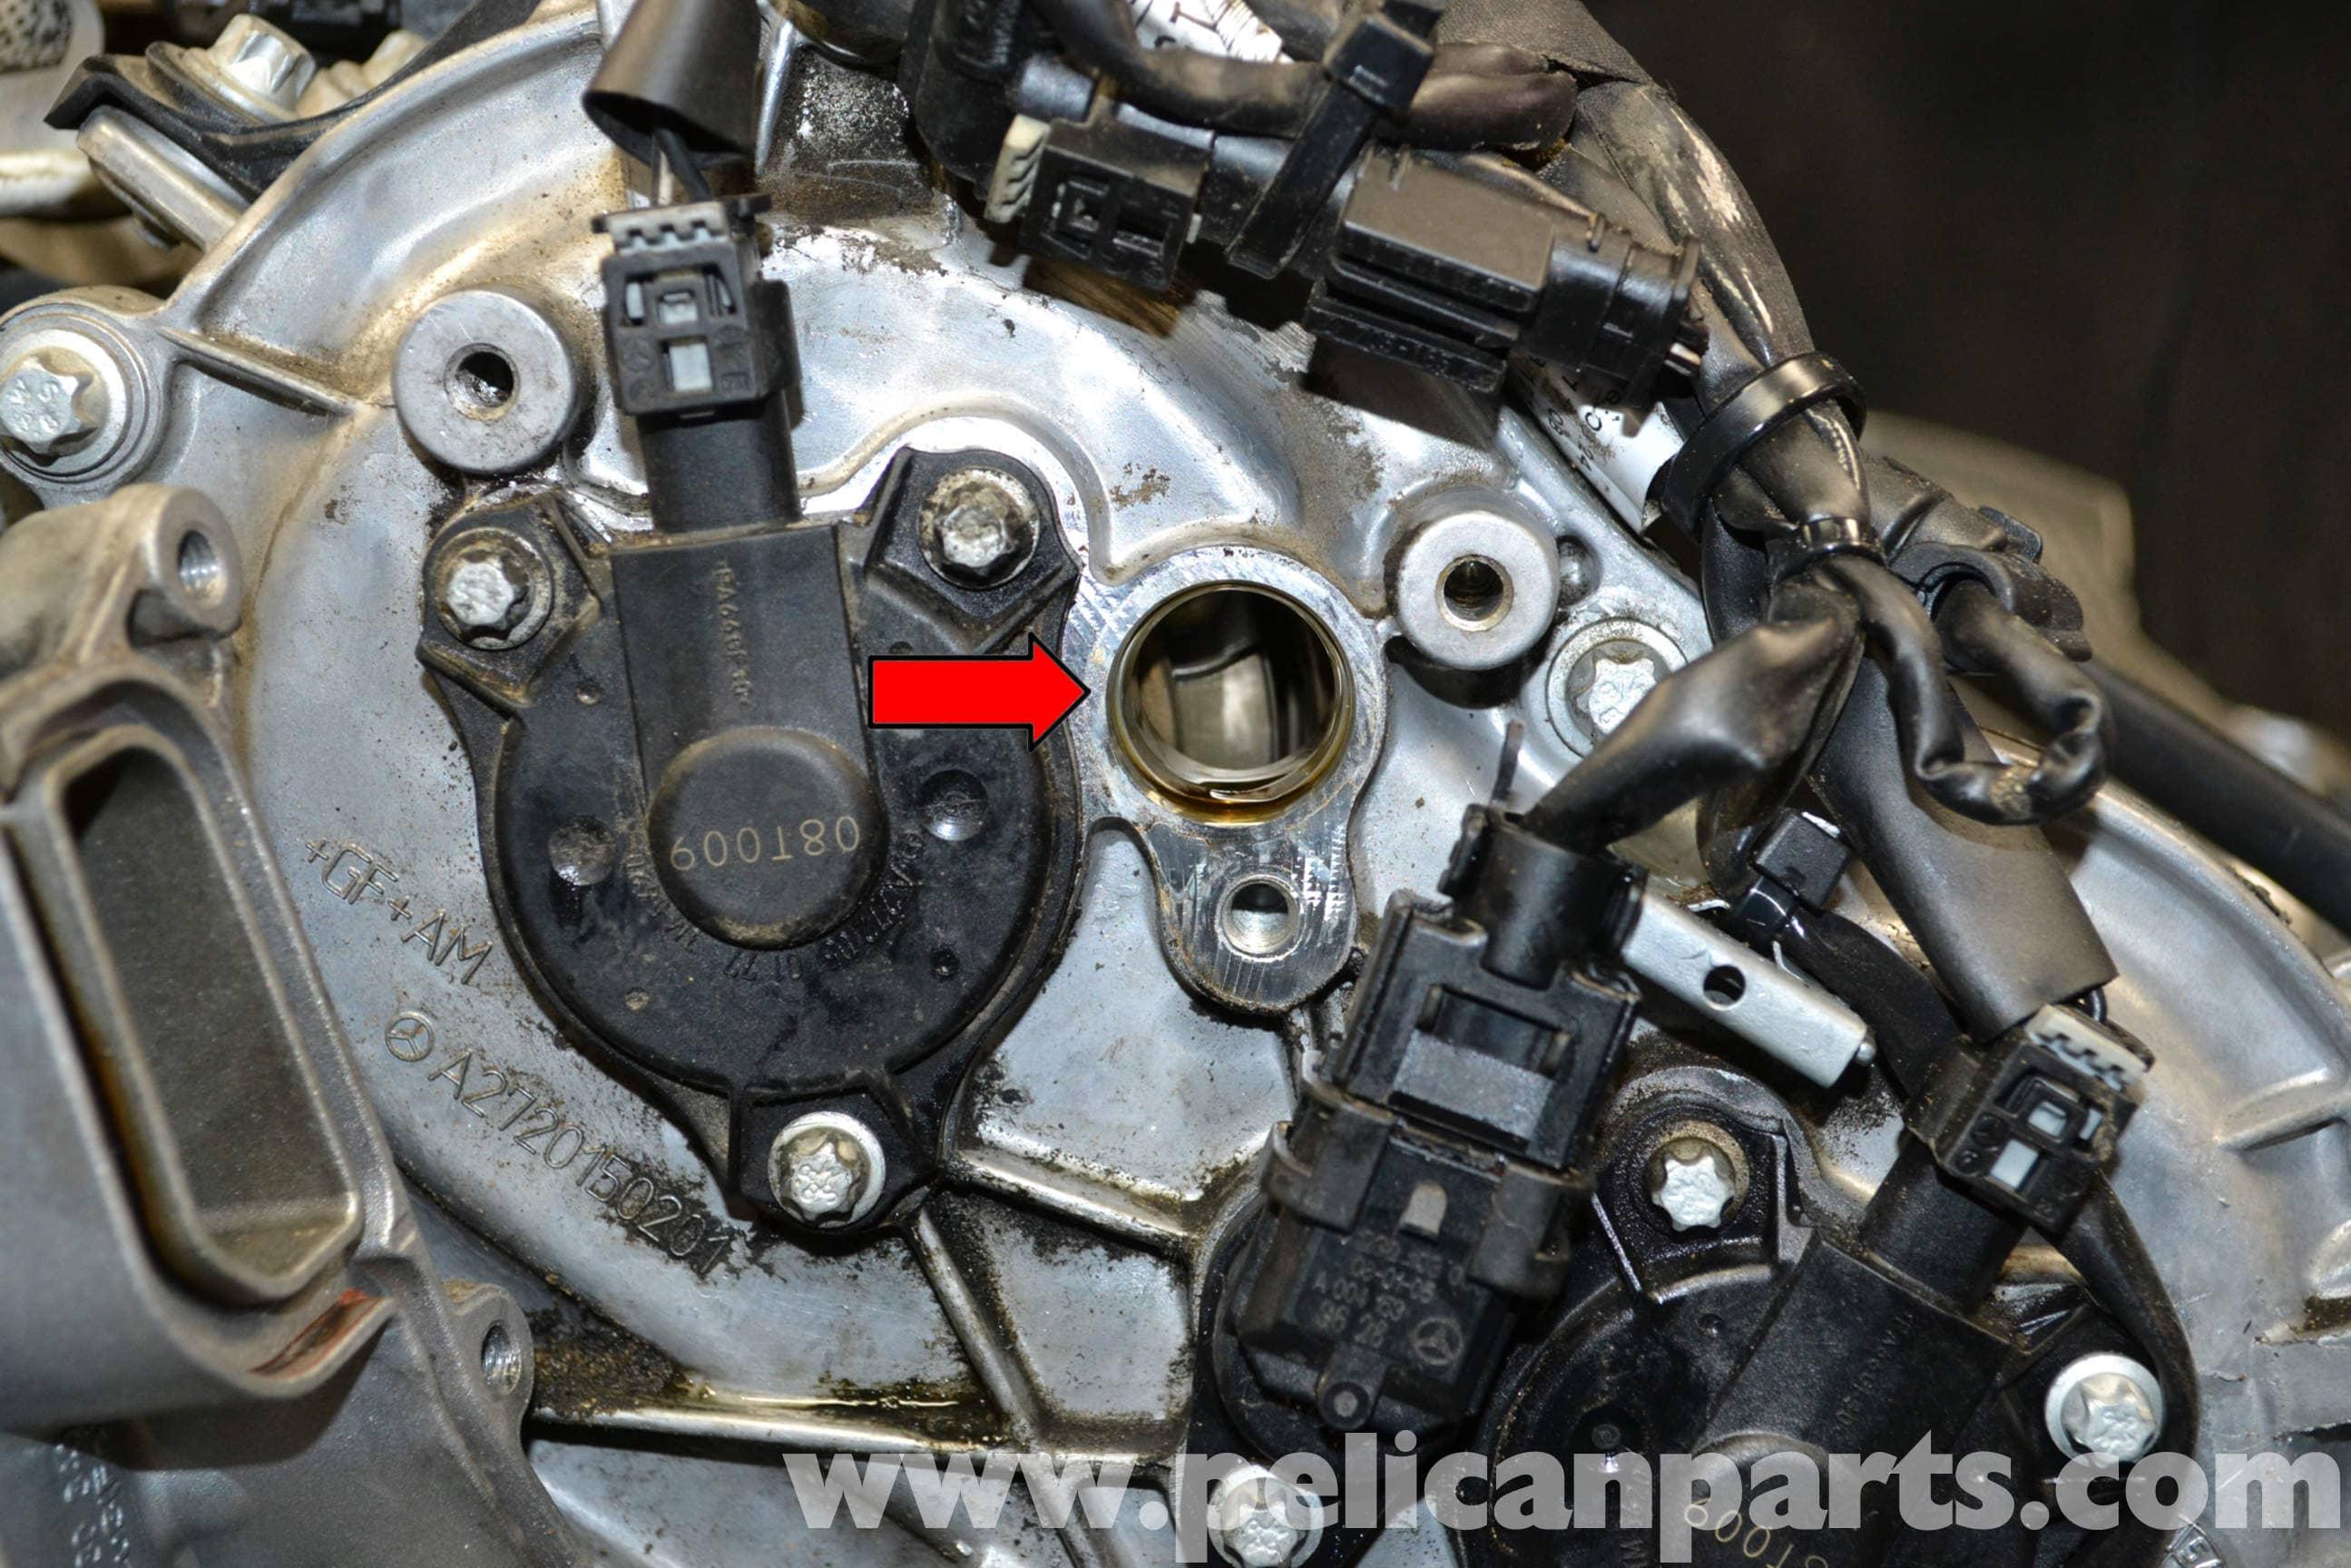 Mercedes-Benz W204 Camshaft Position Sensor Replacement